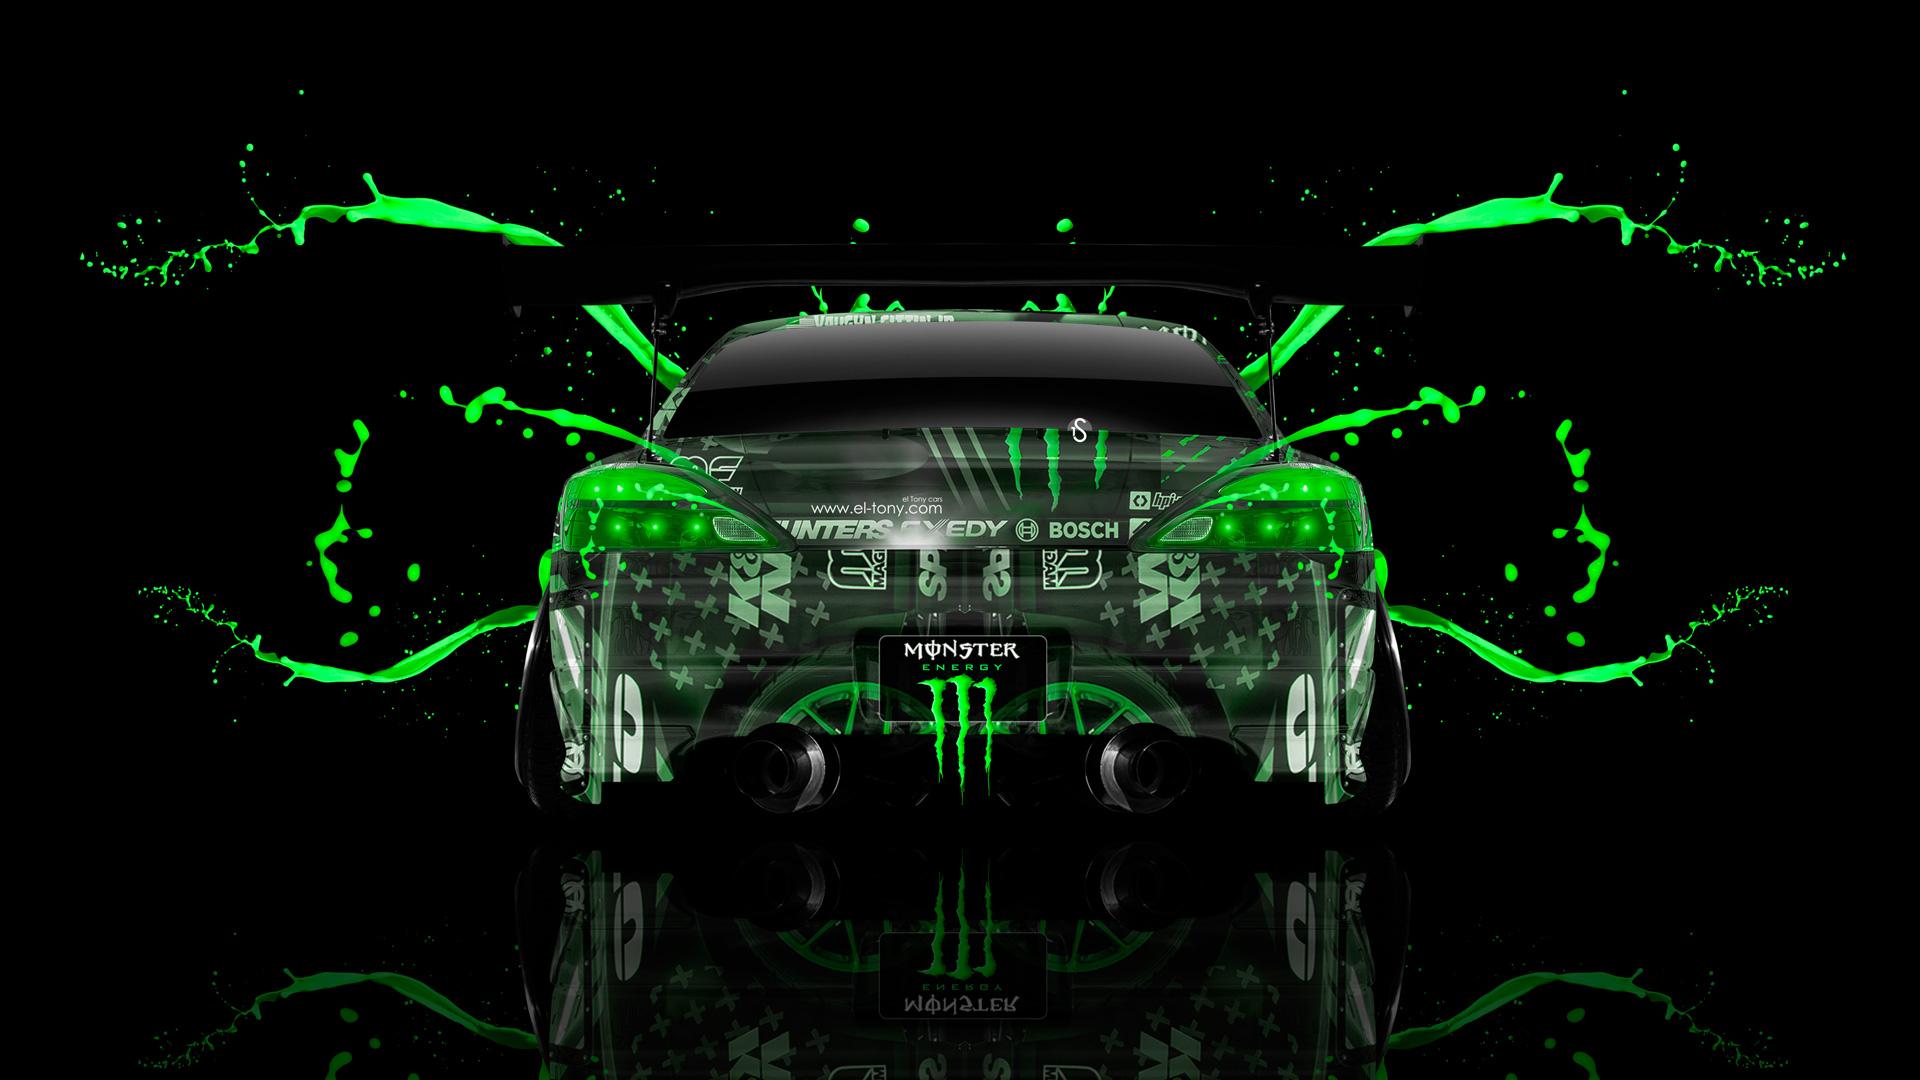 Monster Energy Nissan Silvia S15 JDM Back Green Live Colors Car 2014 1920x1080